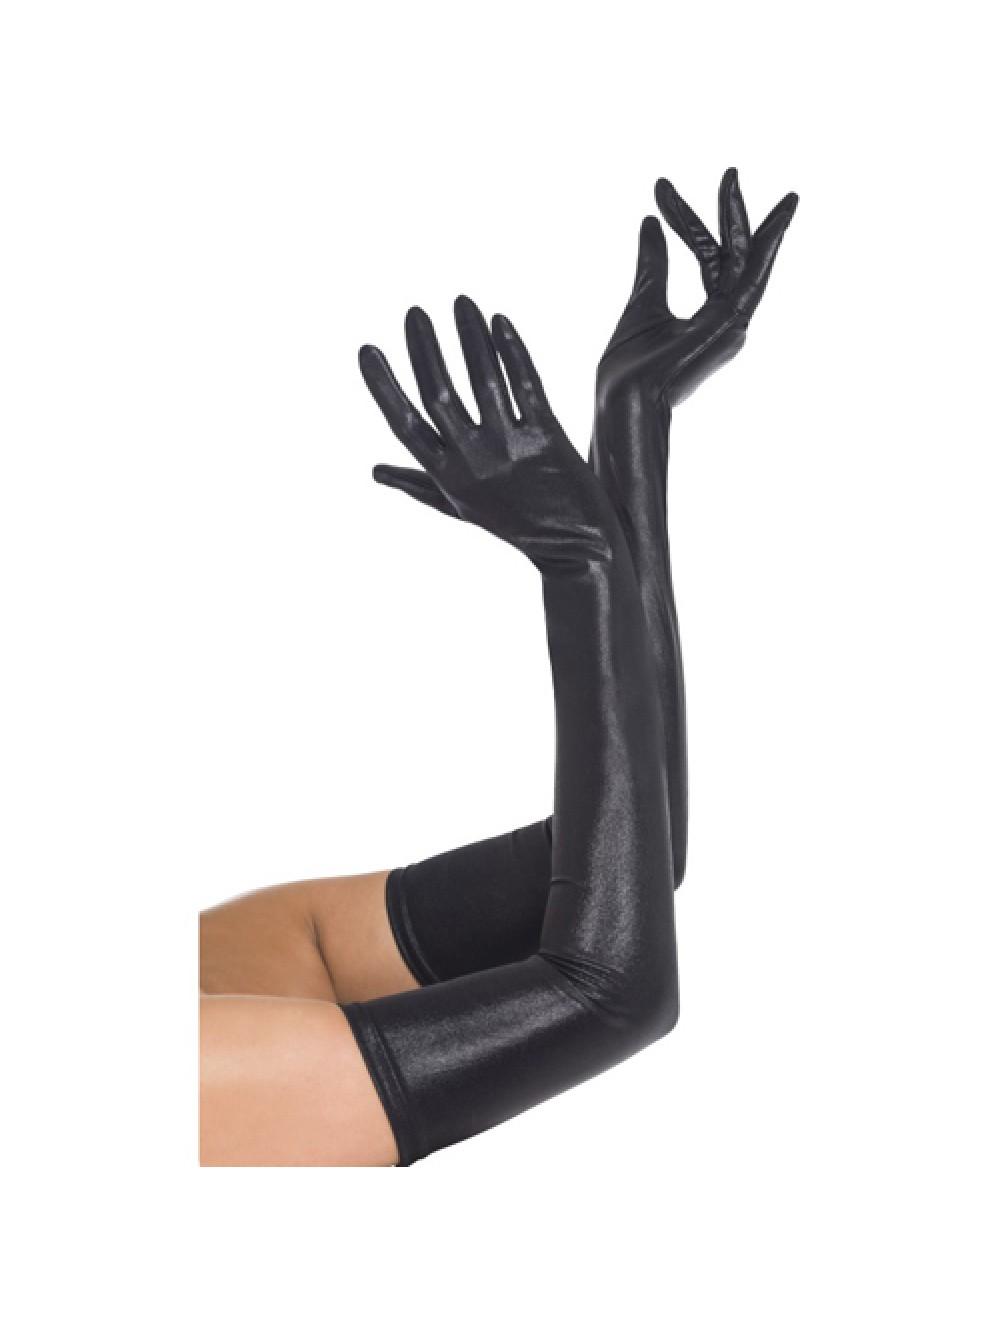 Gloves Wet Look Black 5020570940785